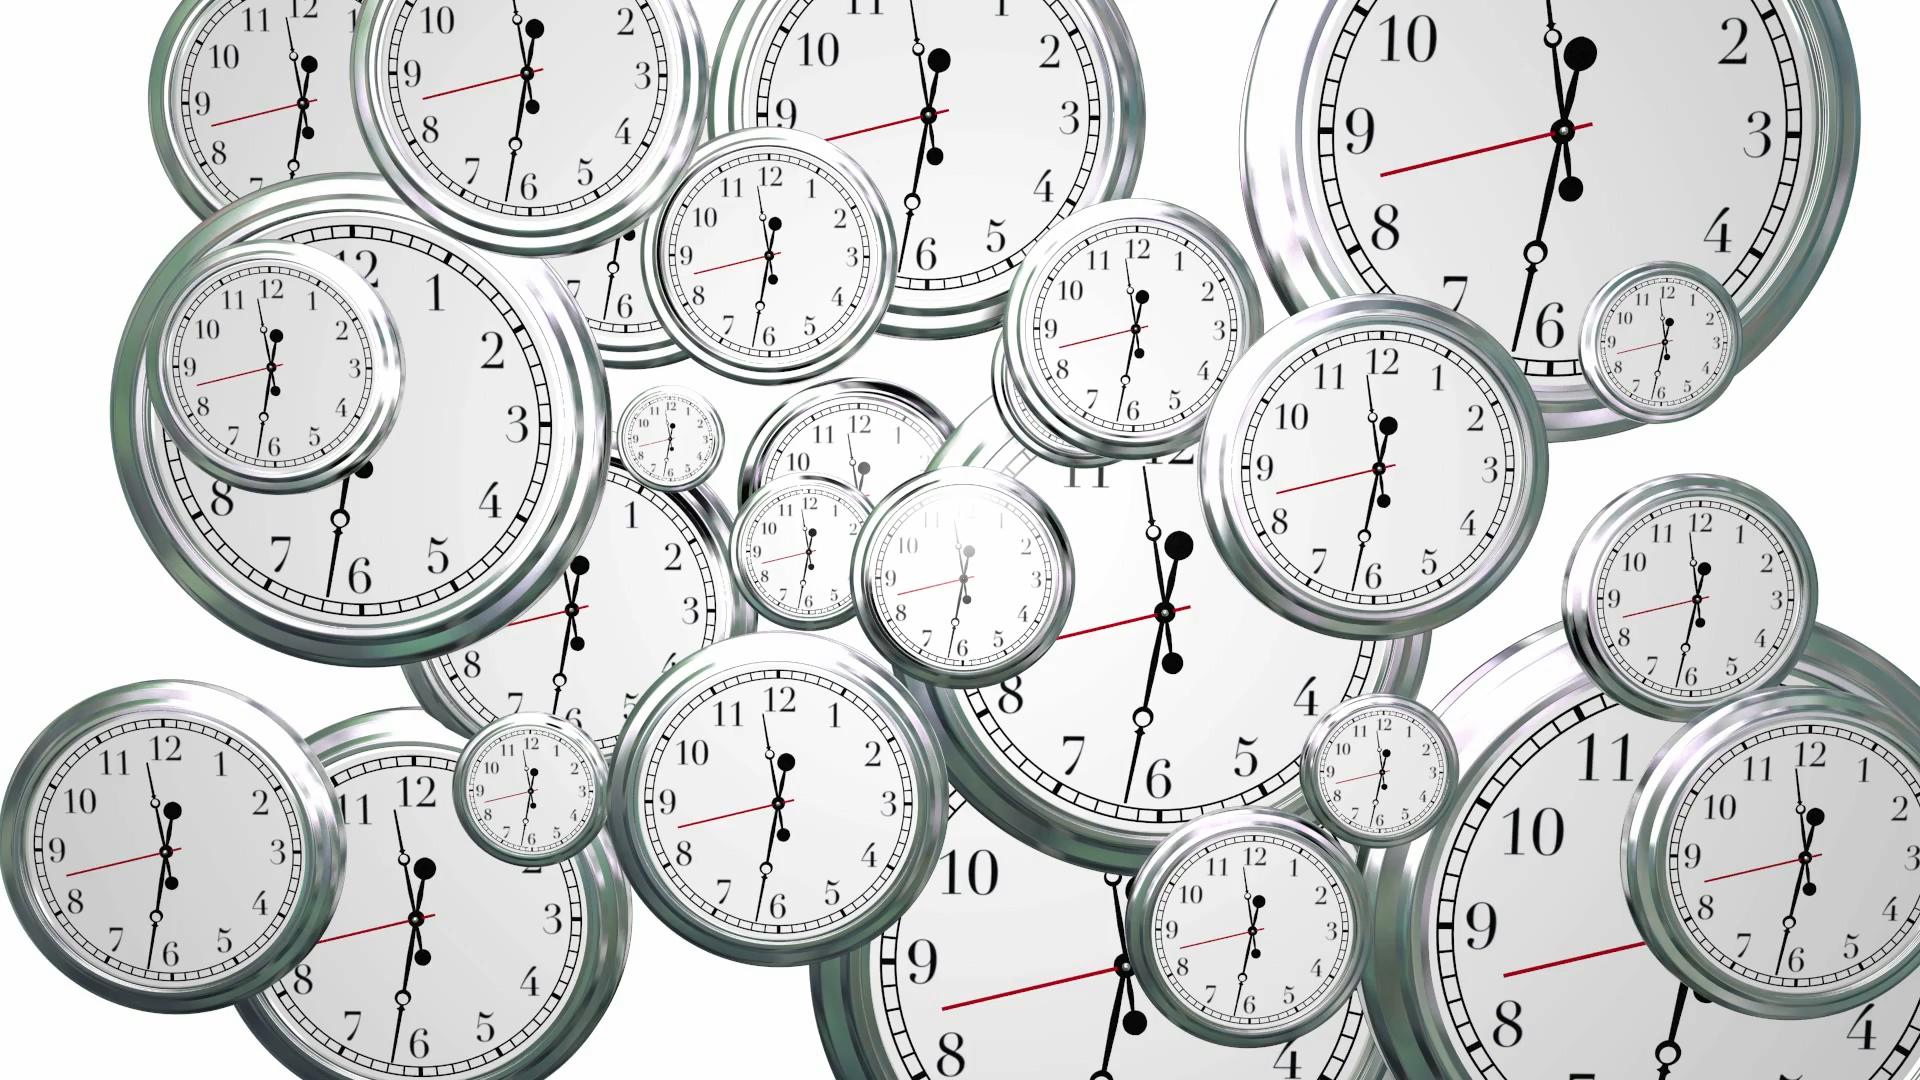 time-passing-clocks-flying-by-animated-video_njm-1att__D.00_00_00_00.Still001.png